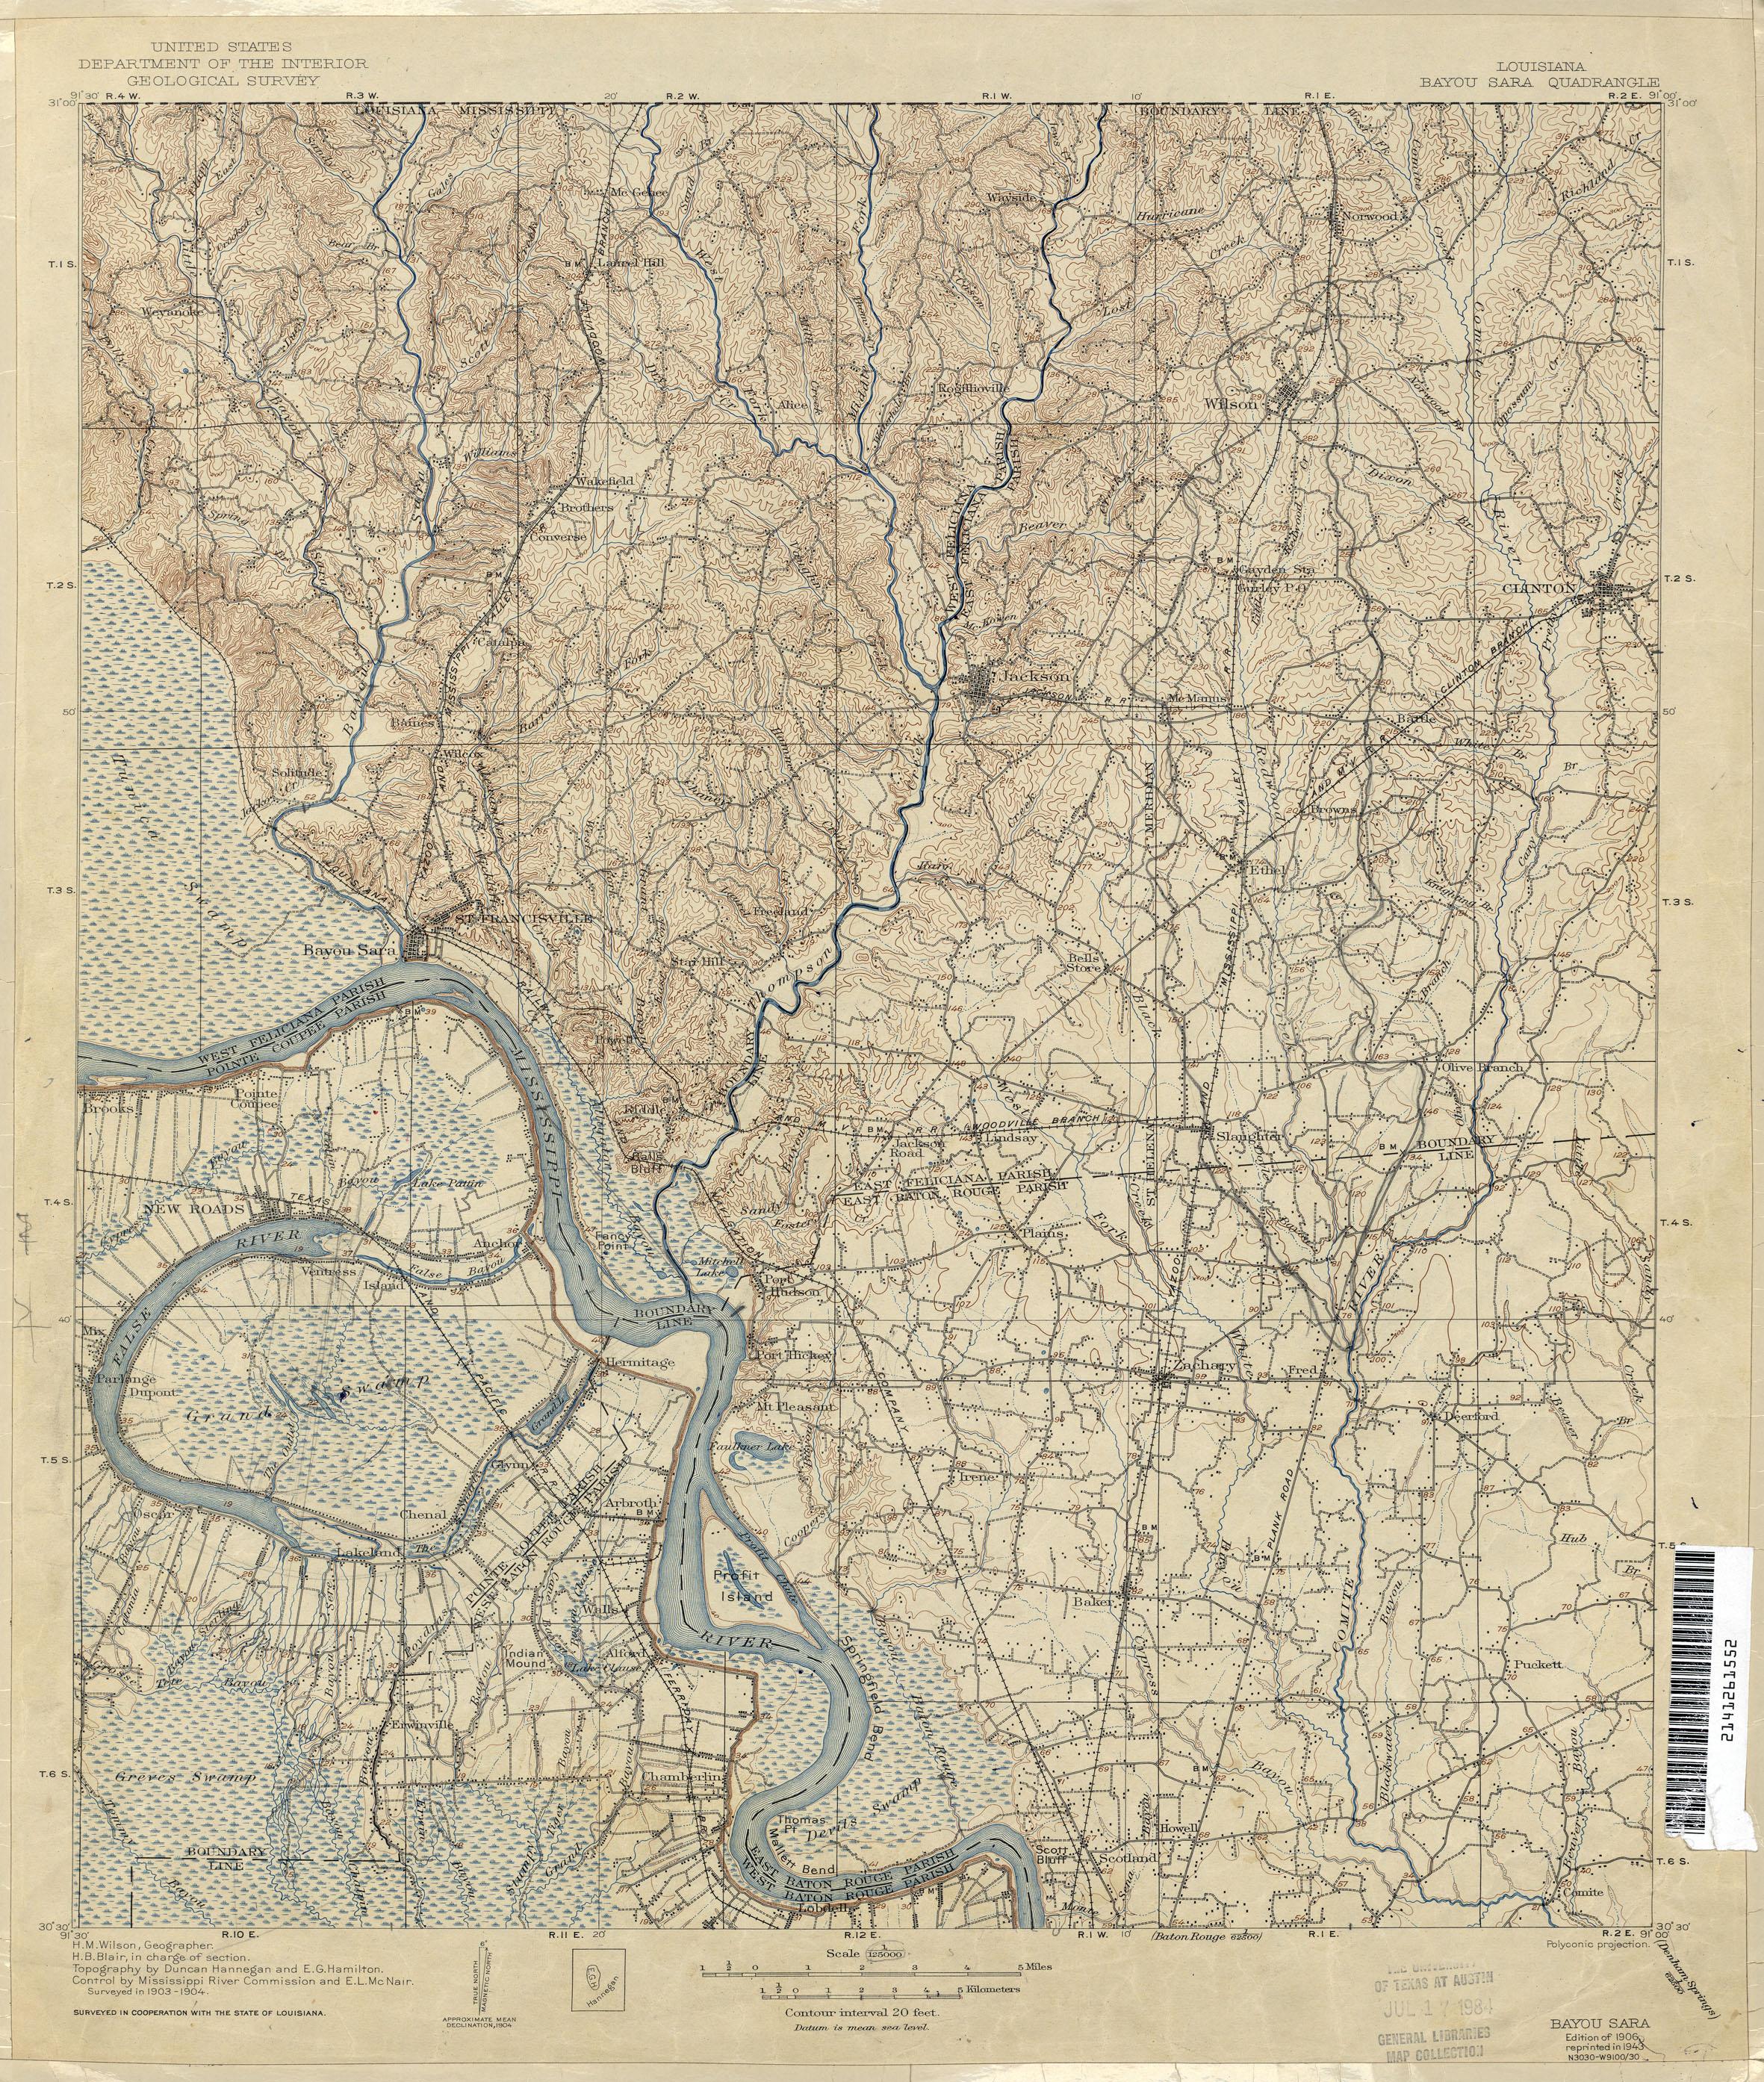 Map Of Louisiana Bayou.Louisiana Topographic Maps Perry Castaneda Map Collection Ut